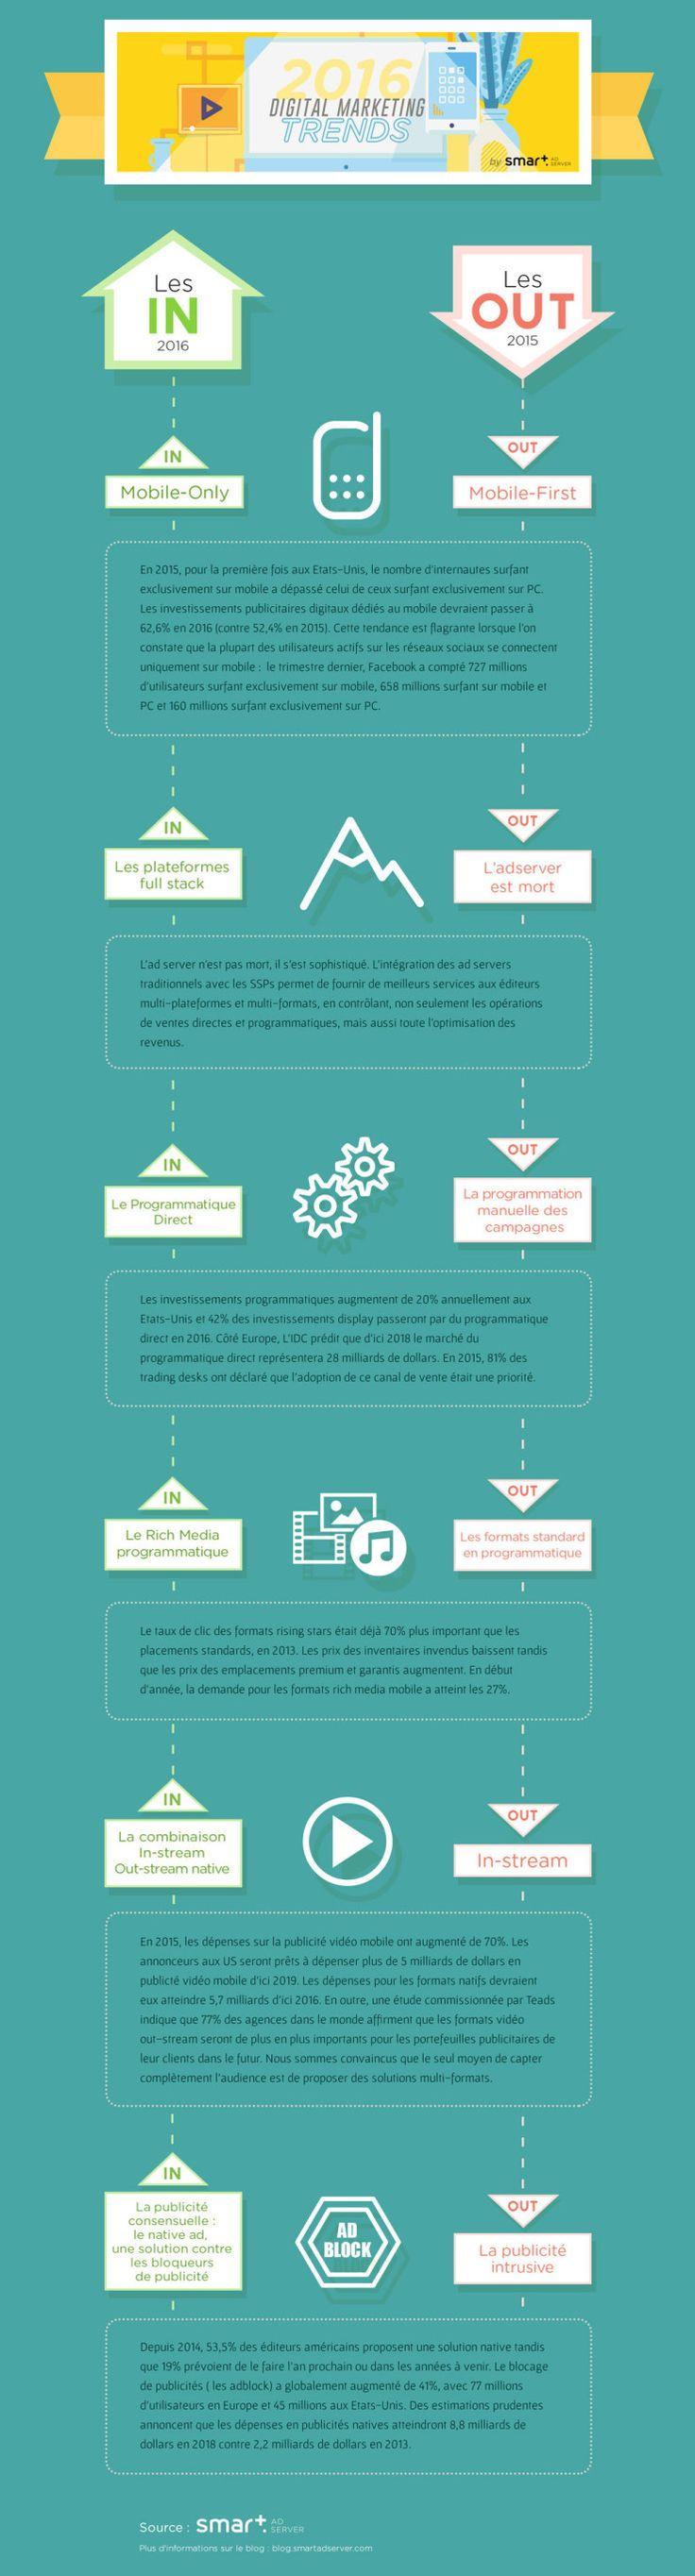 Les tendances du marketing digital en 2016 #infographie #smartadserver #digital